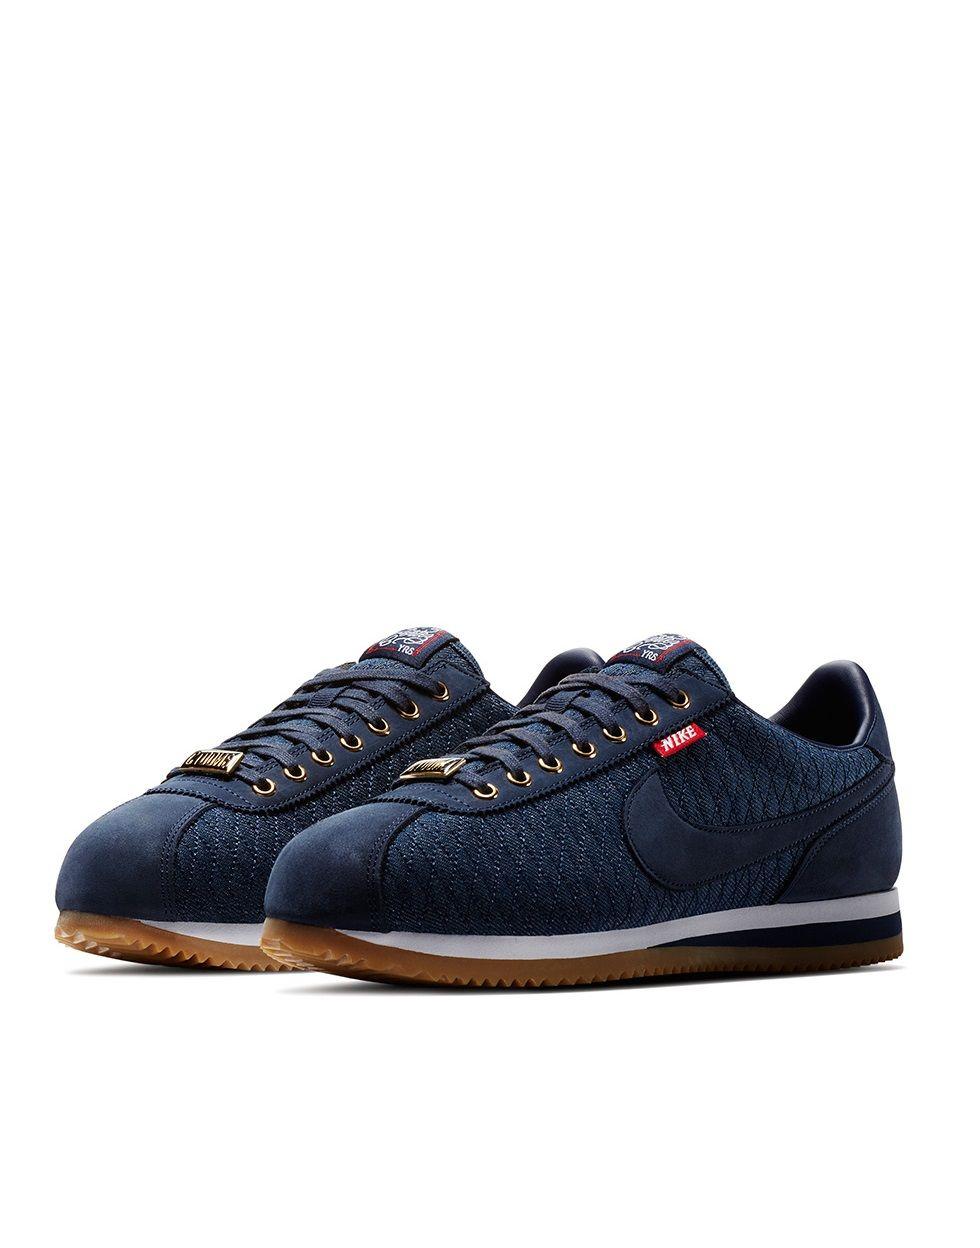 best sneakers 14bb6 b7629 Mister Cartoon x Nike Cortez | Brooklyn fashion | Nike ...